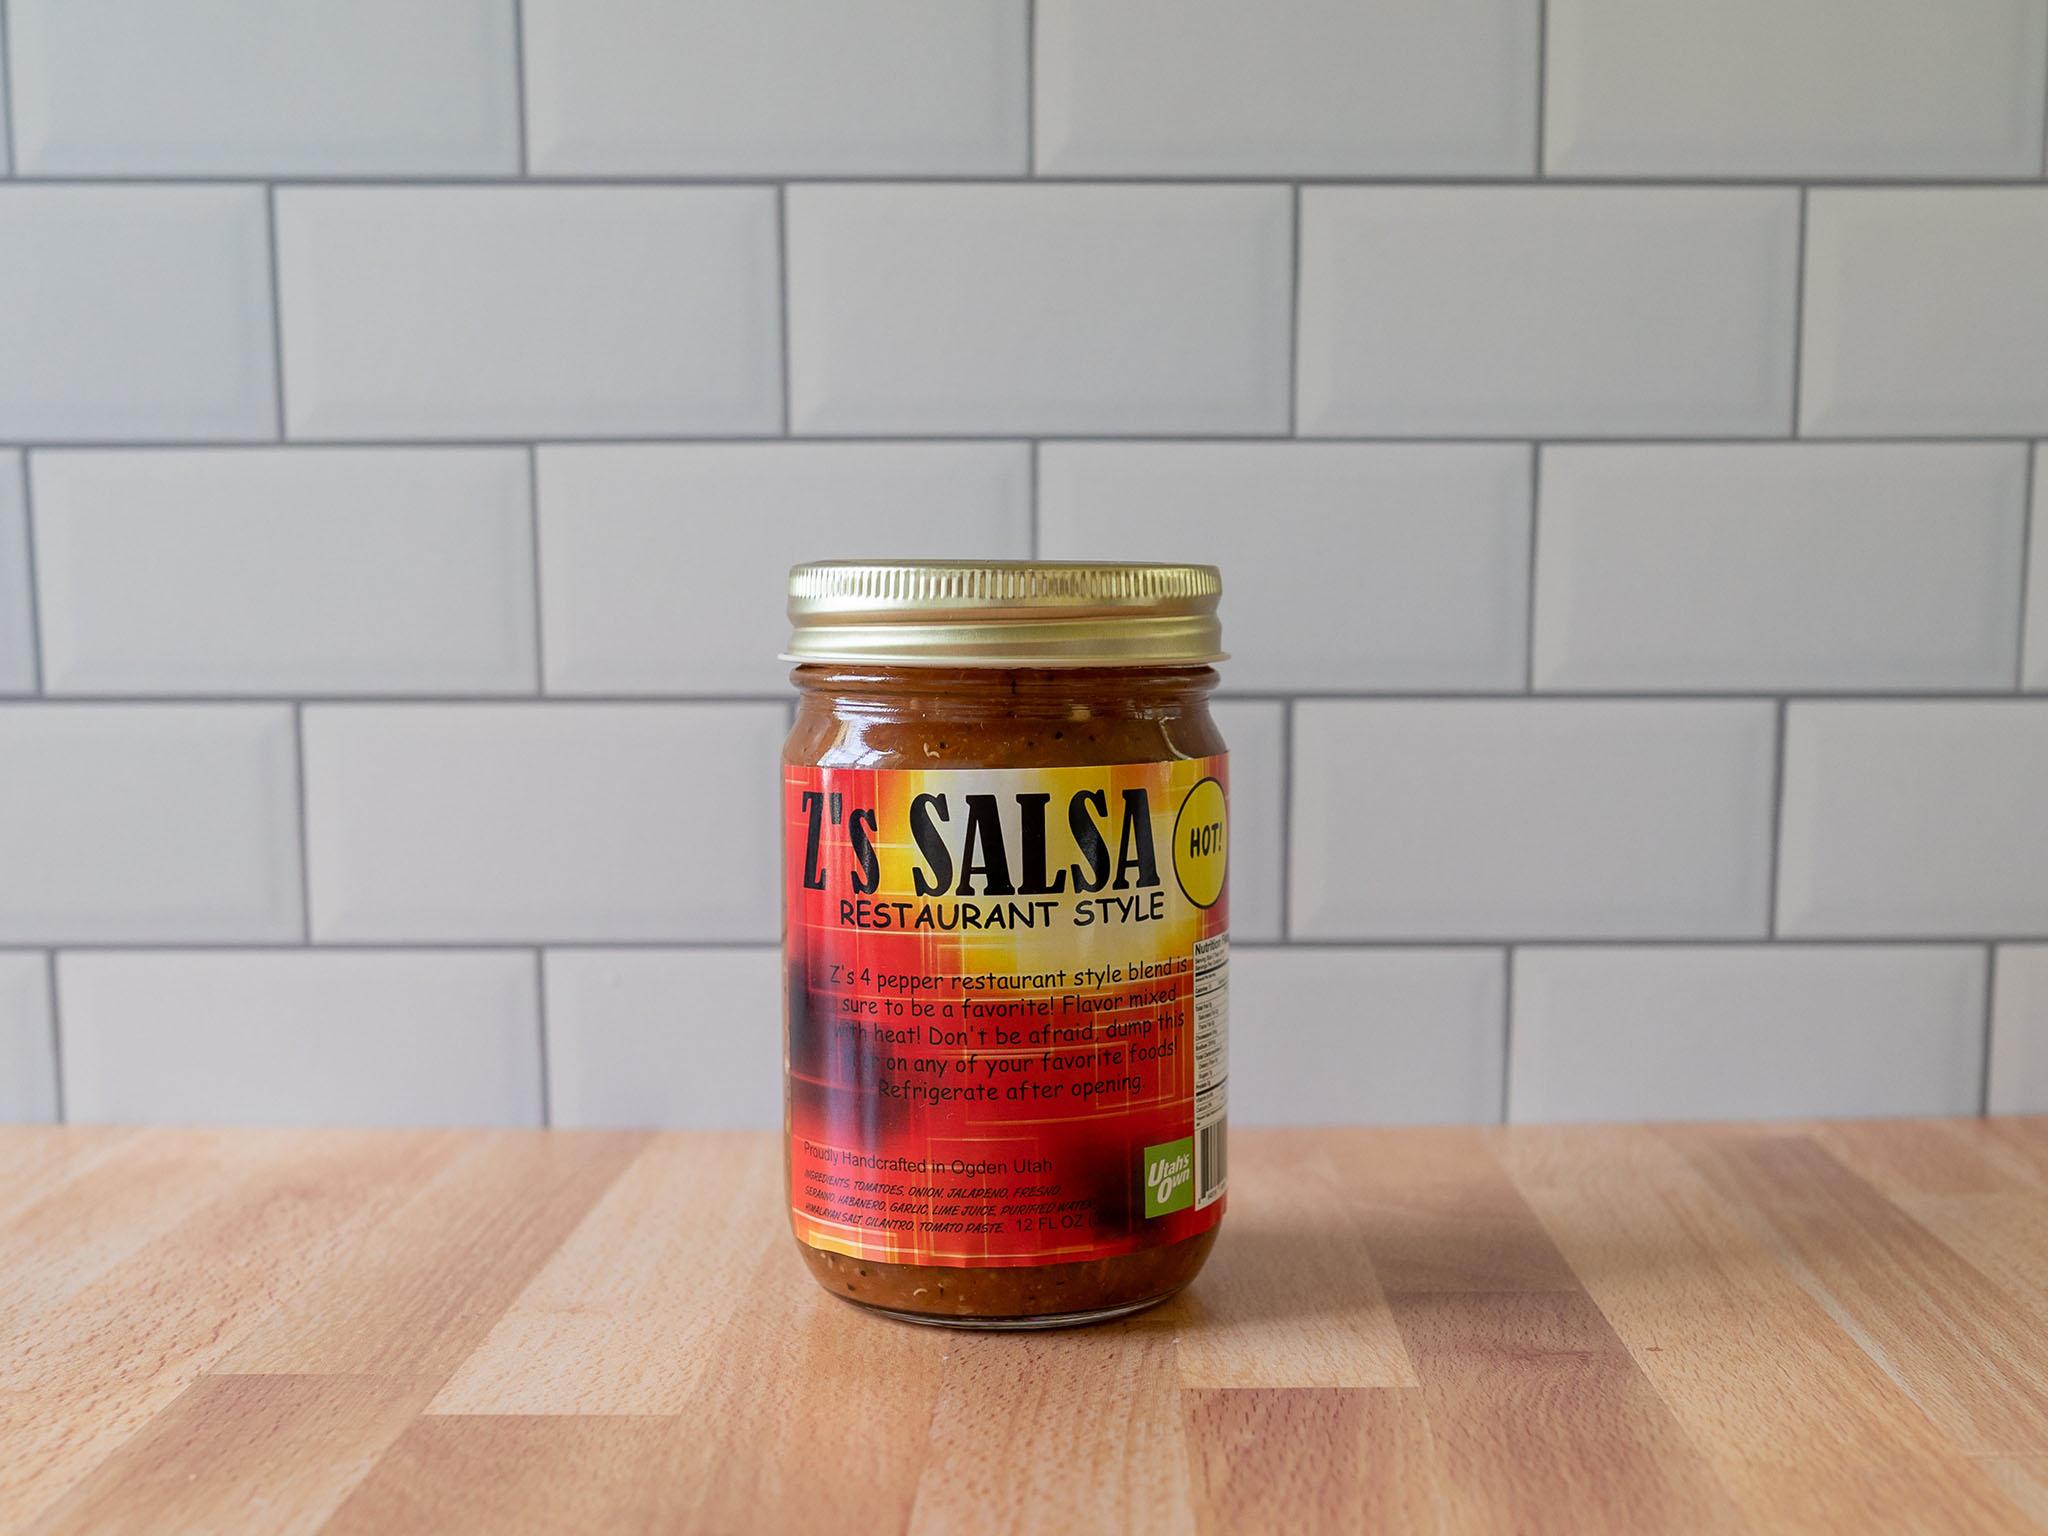 Z's Restaurant Style Hot Salsa